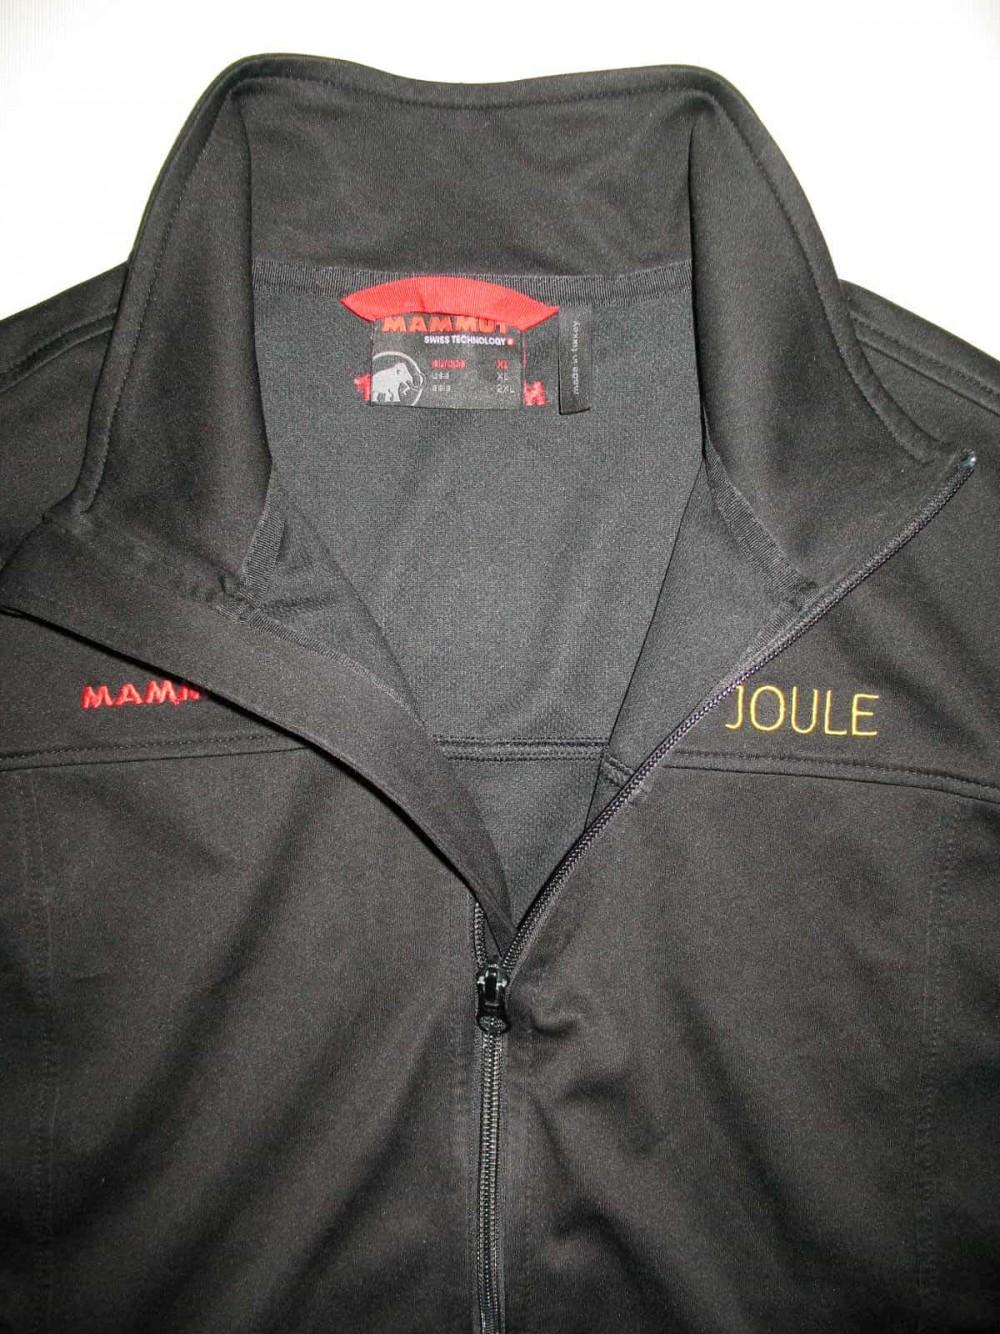 Жилет MAMMUT gp softshell vest (размер XL) - 2